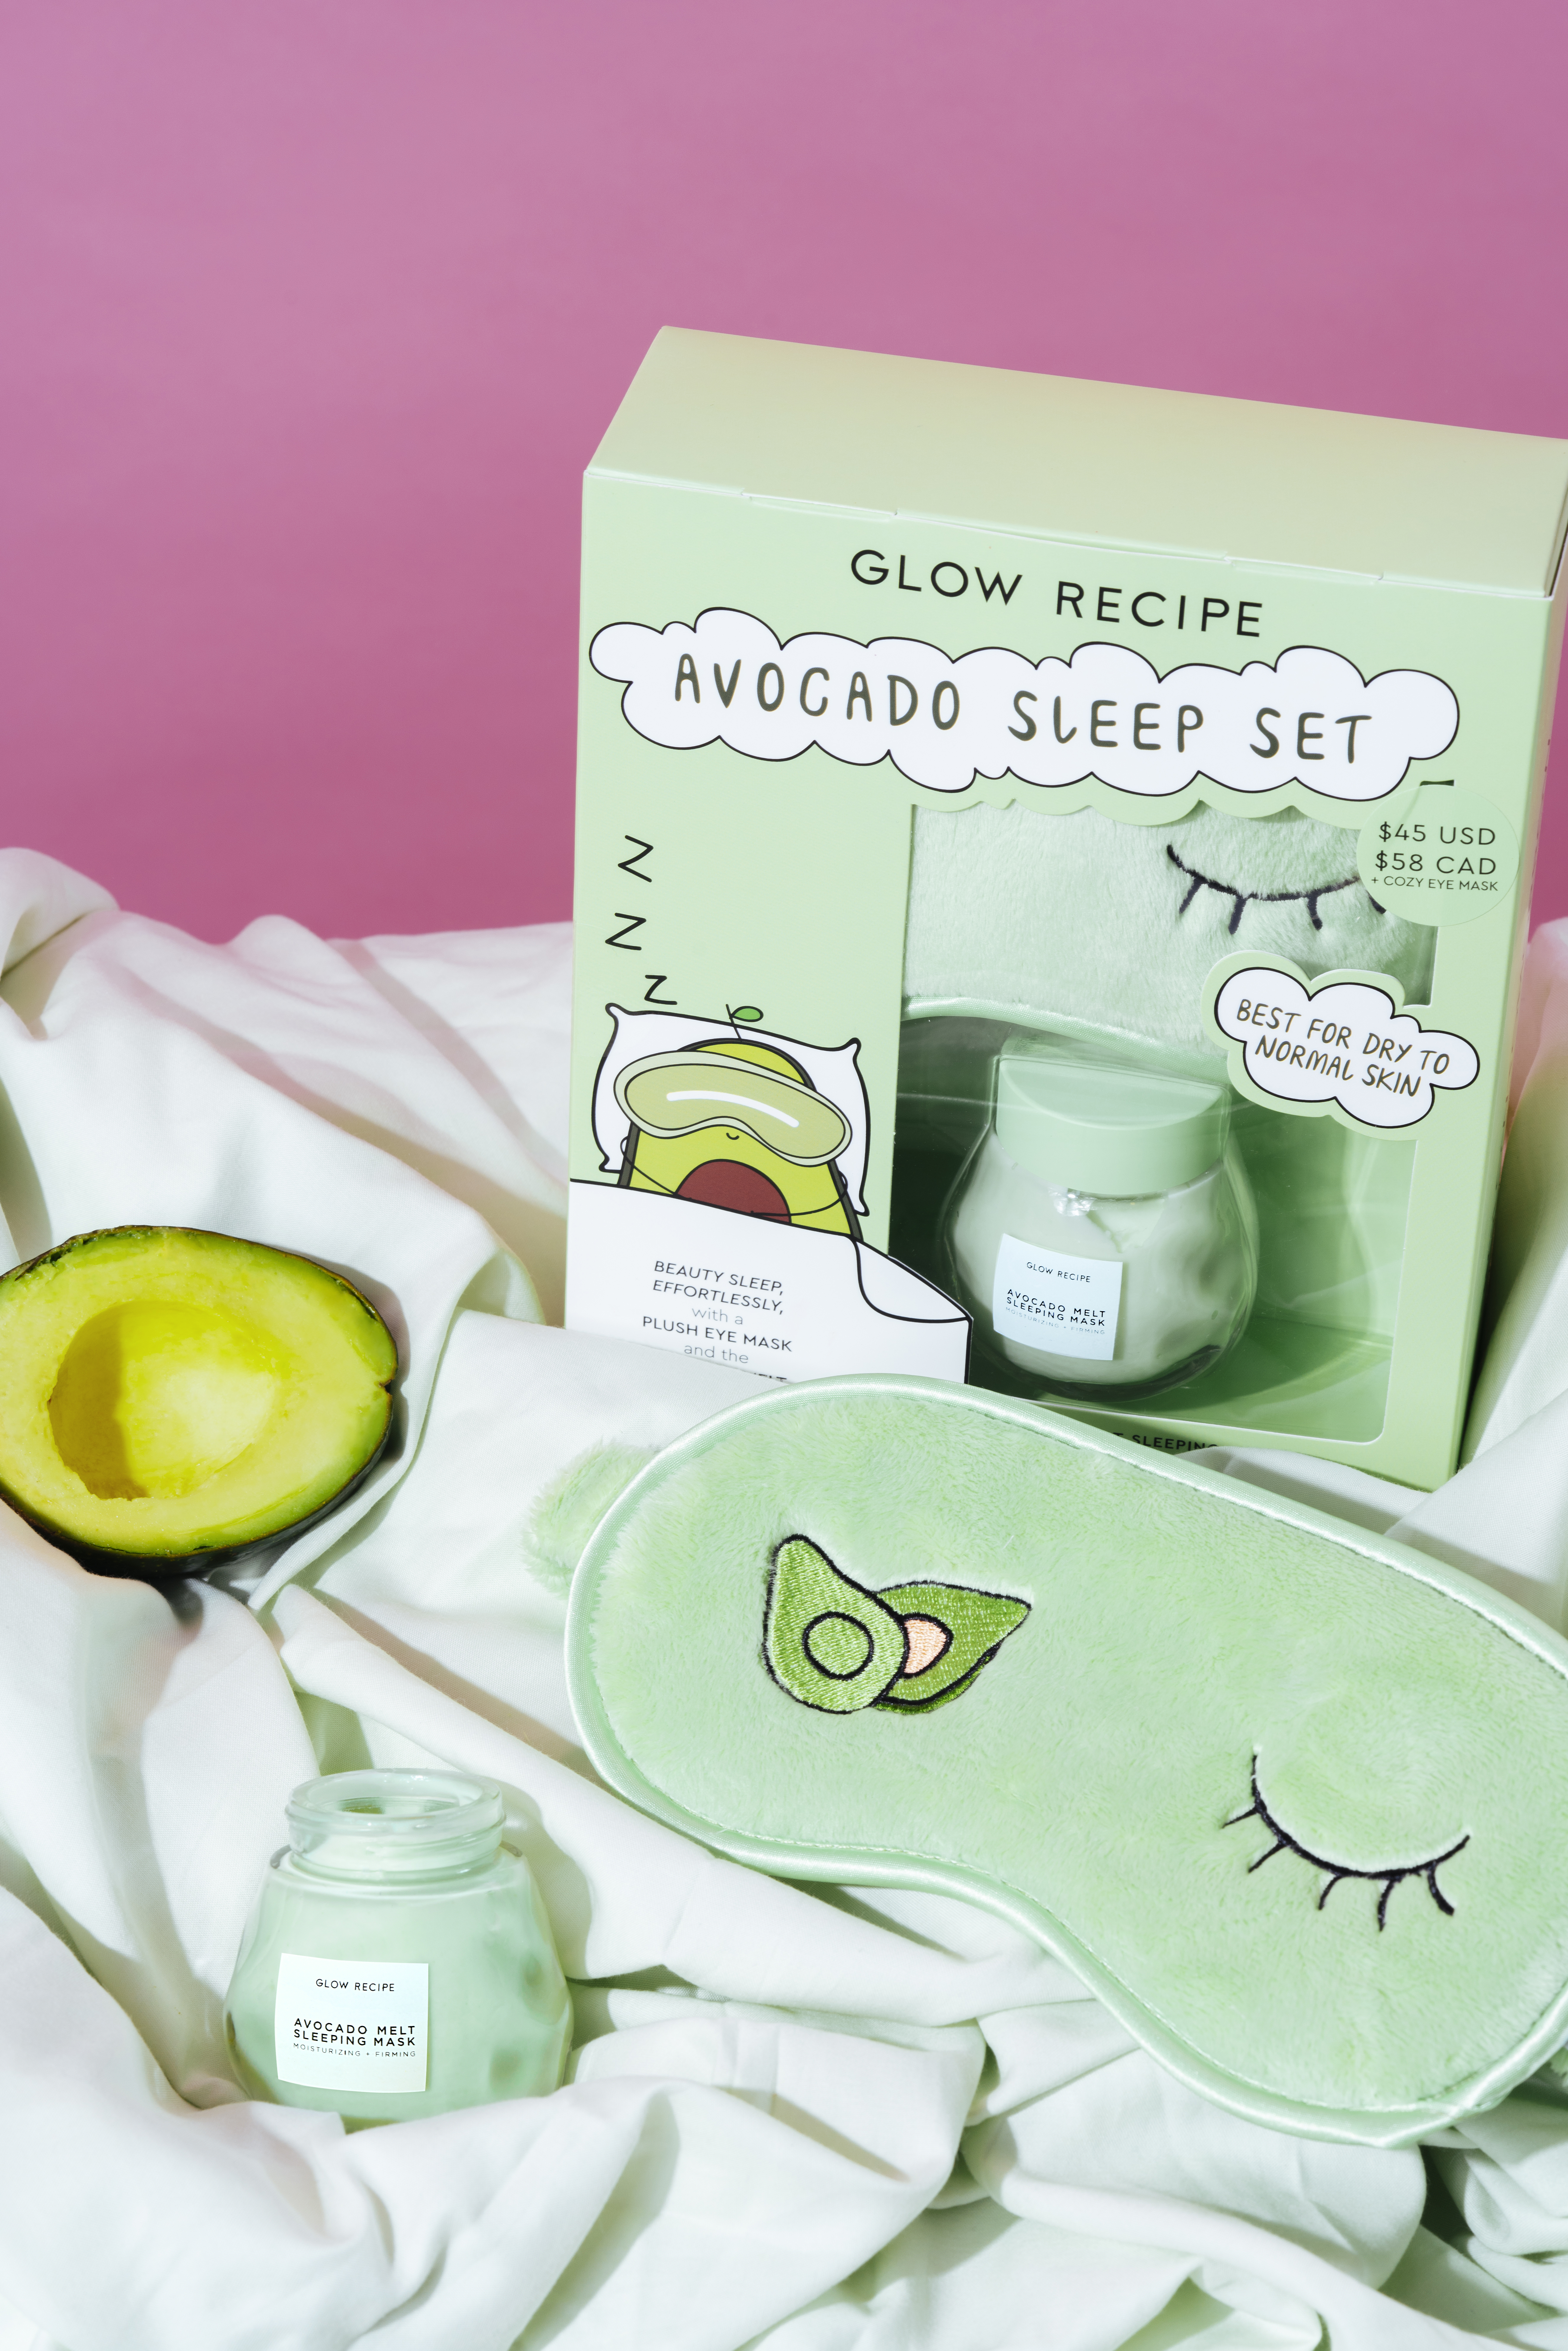 Avocado-Sleep-Set